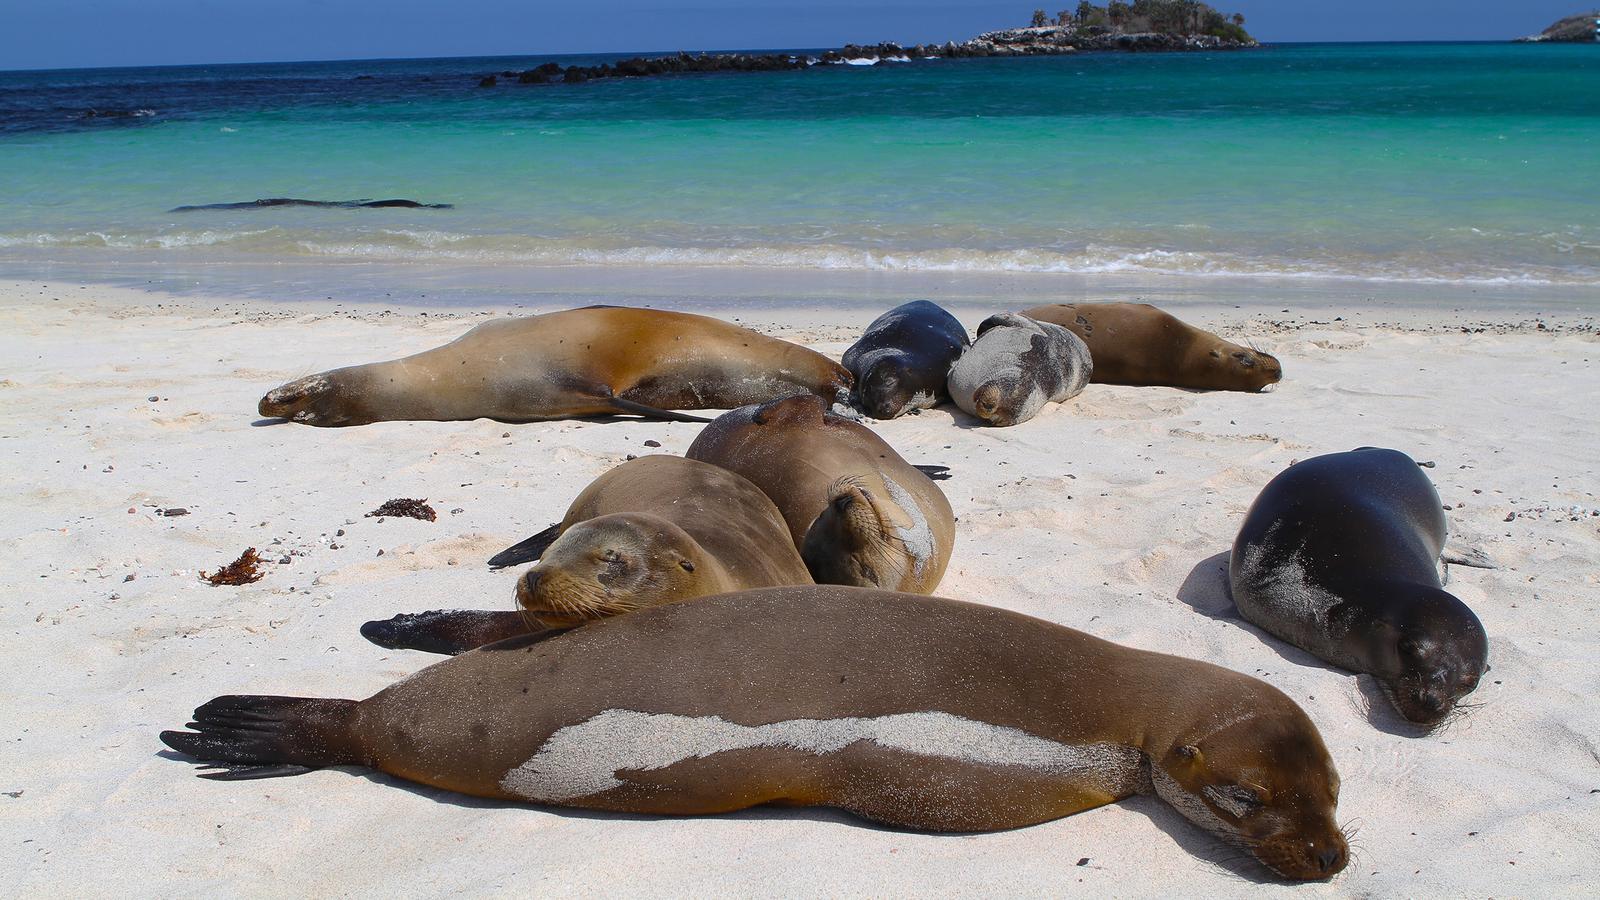 Galápagos — West & Central Islands aboard the Eden